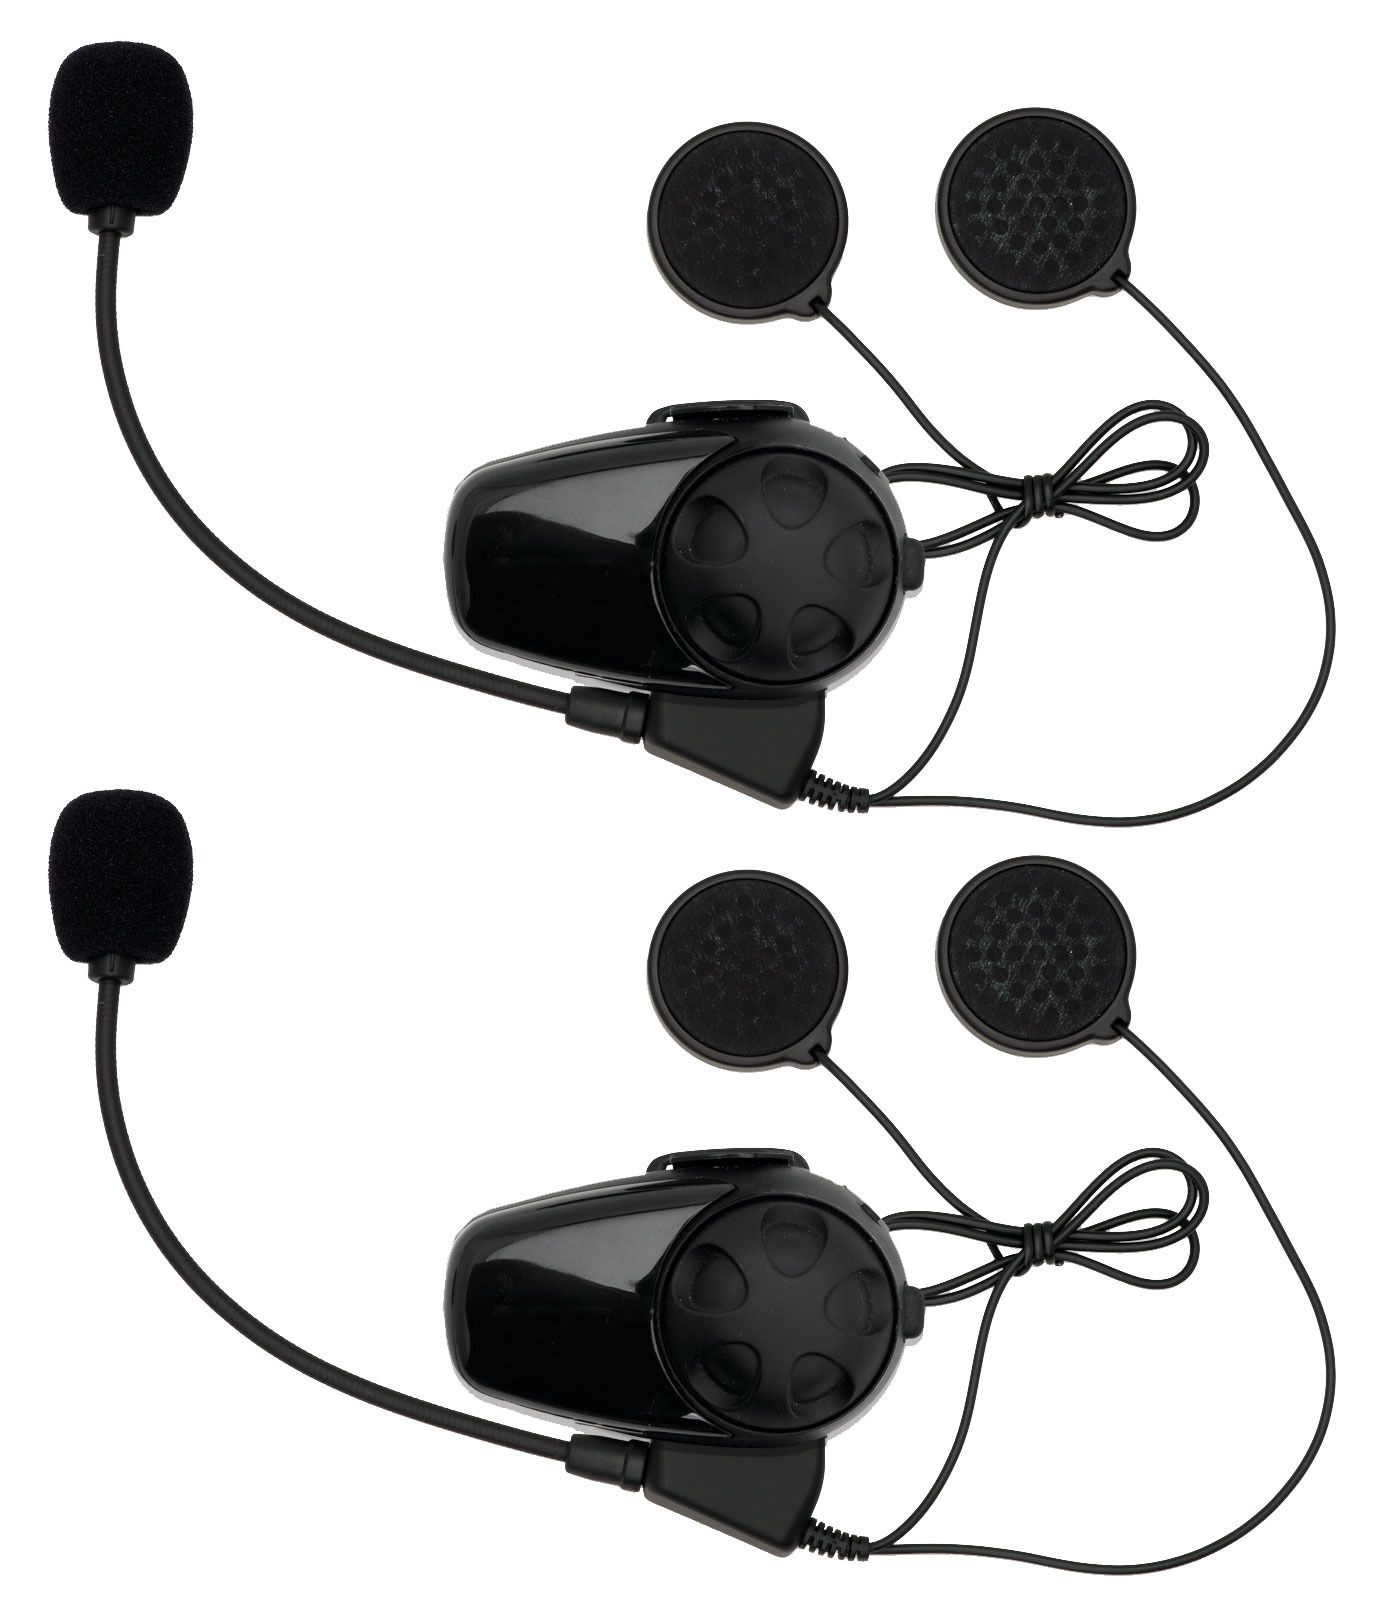 bell mag 9 qualifier dlx sena smh 10 bluetooth headset dual pack revzilla. Black Bedroom Furniture Sets. Home Design Ideas